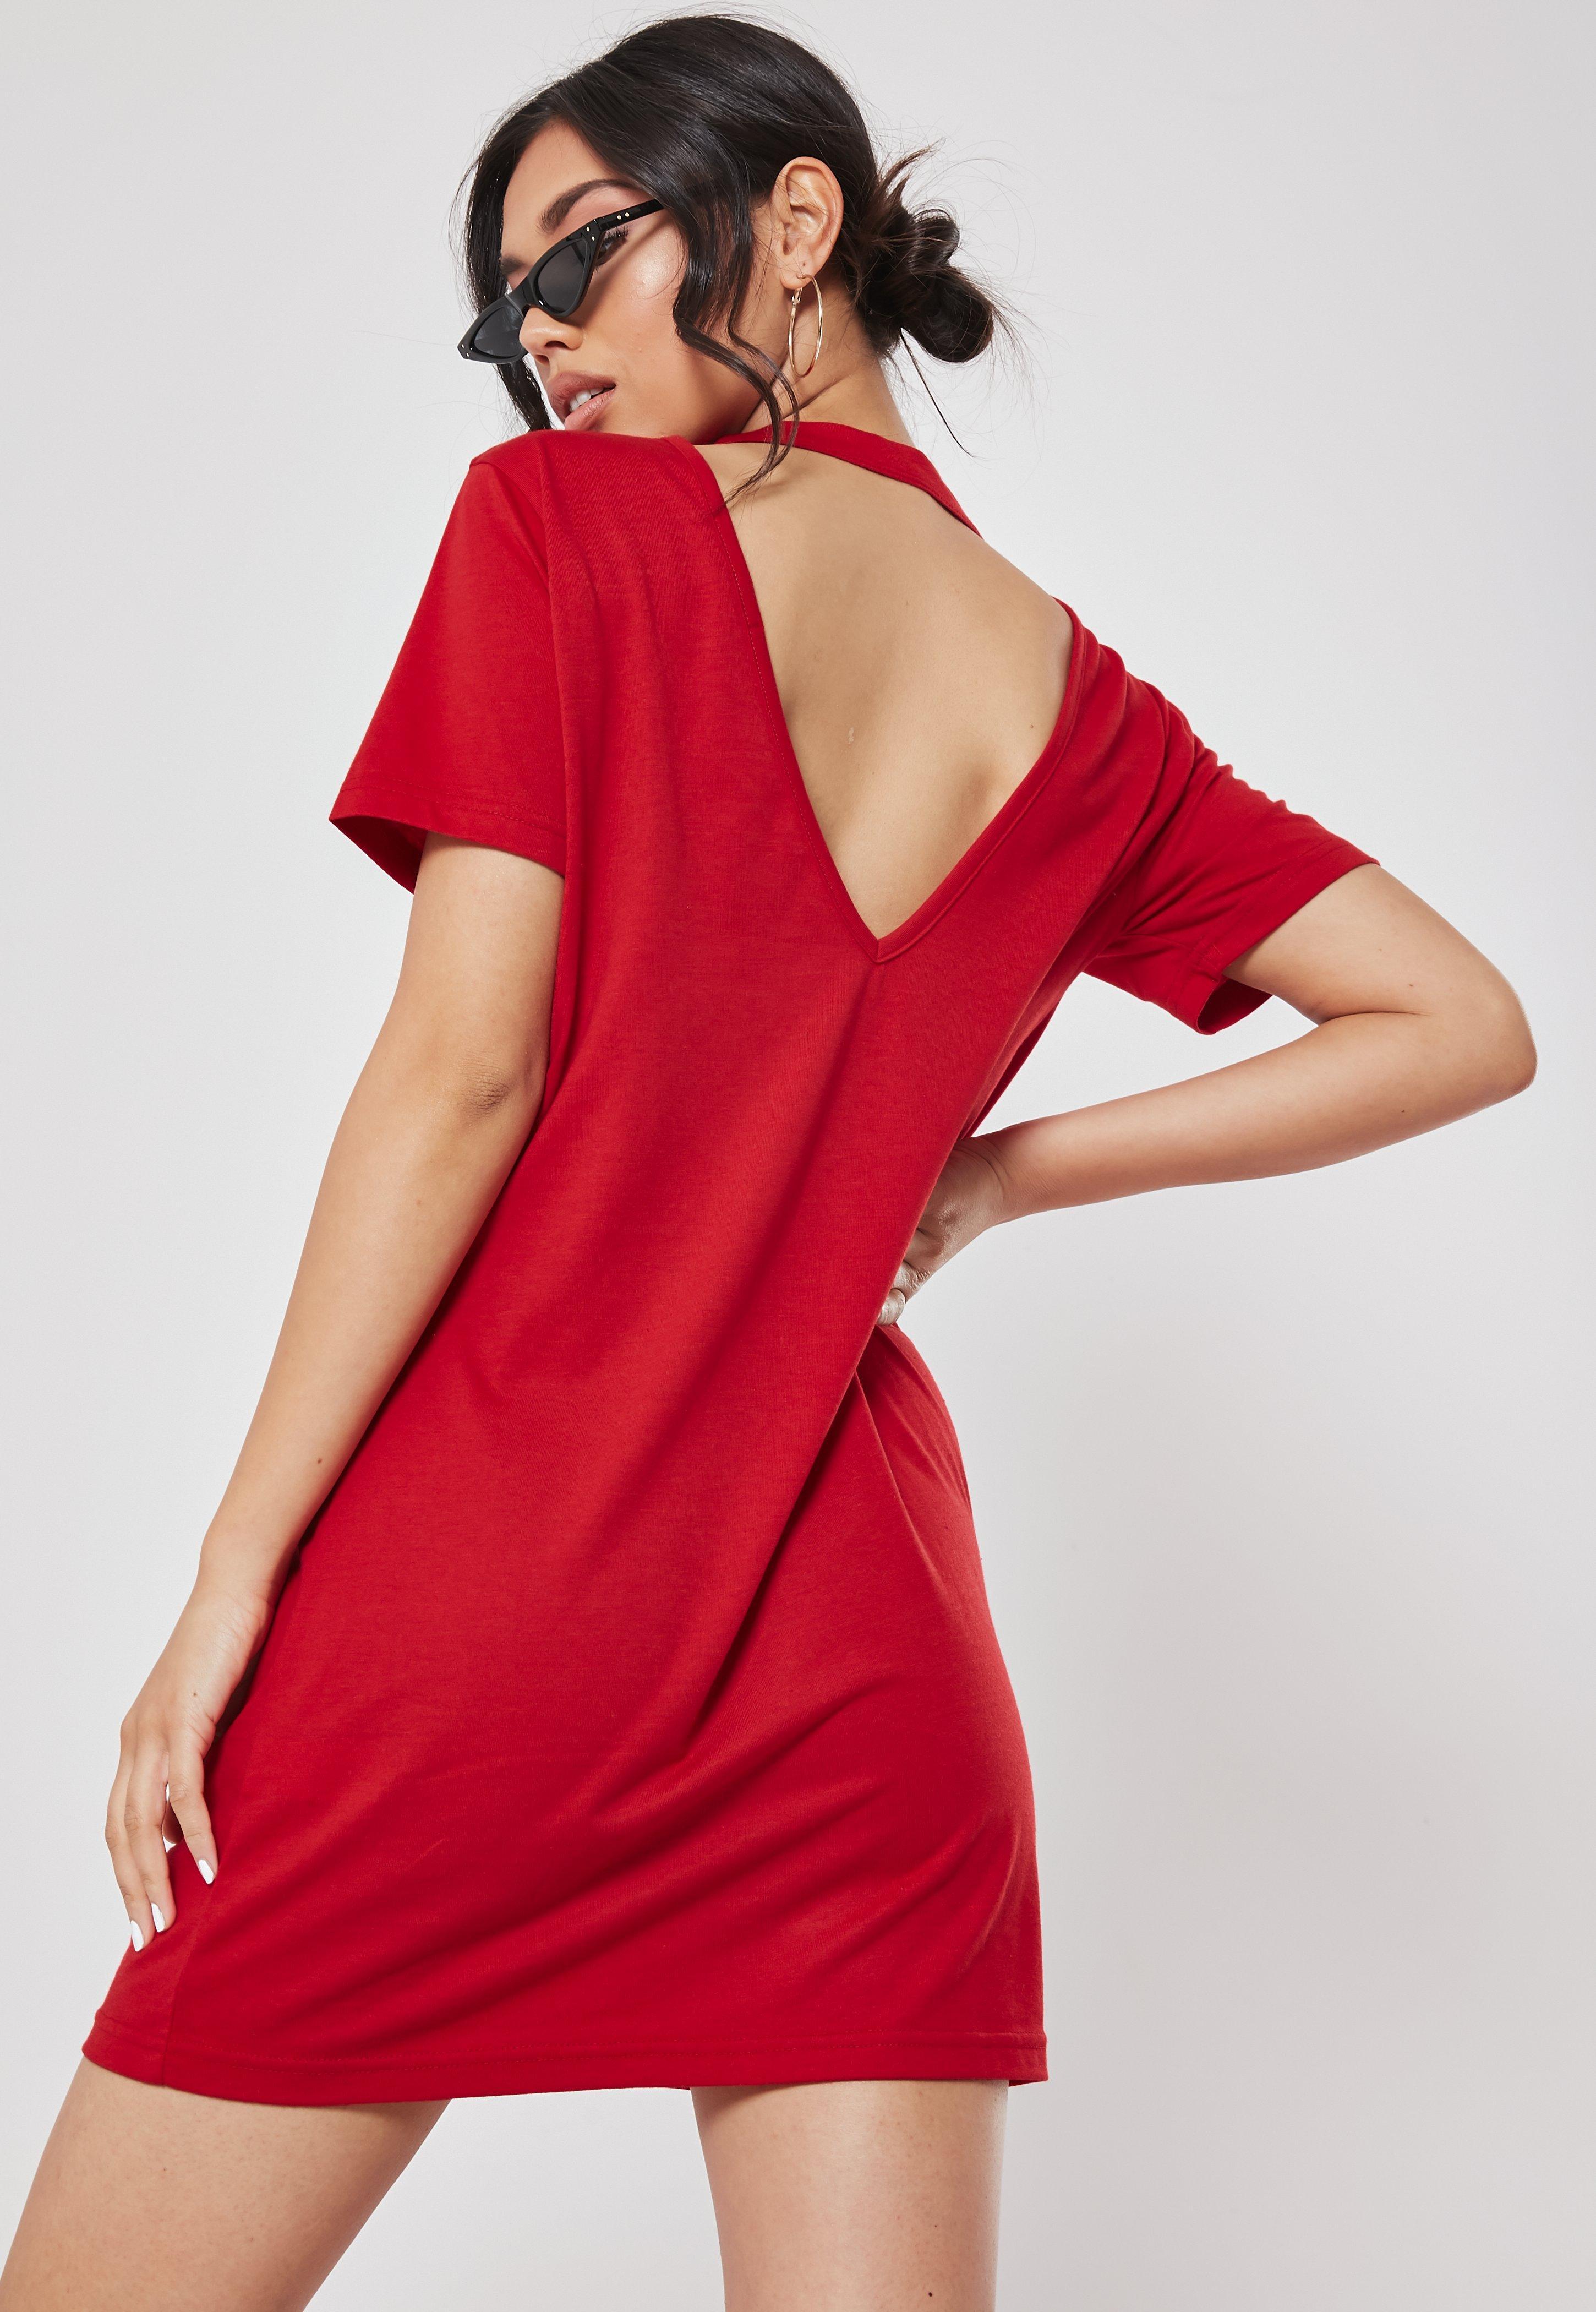 df0ca9b88c0 Backless Dresses